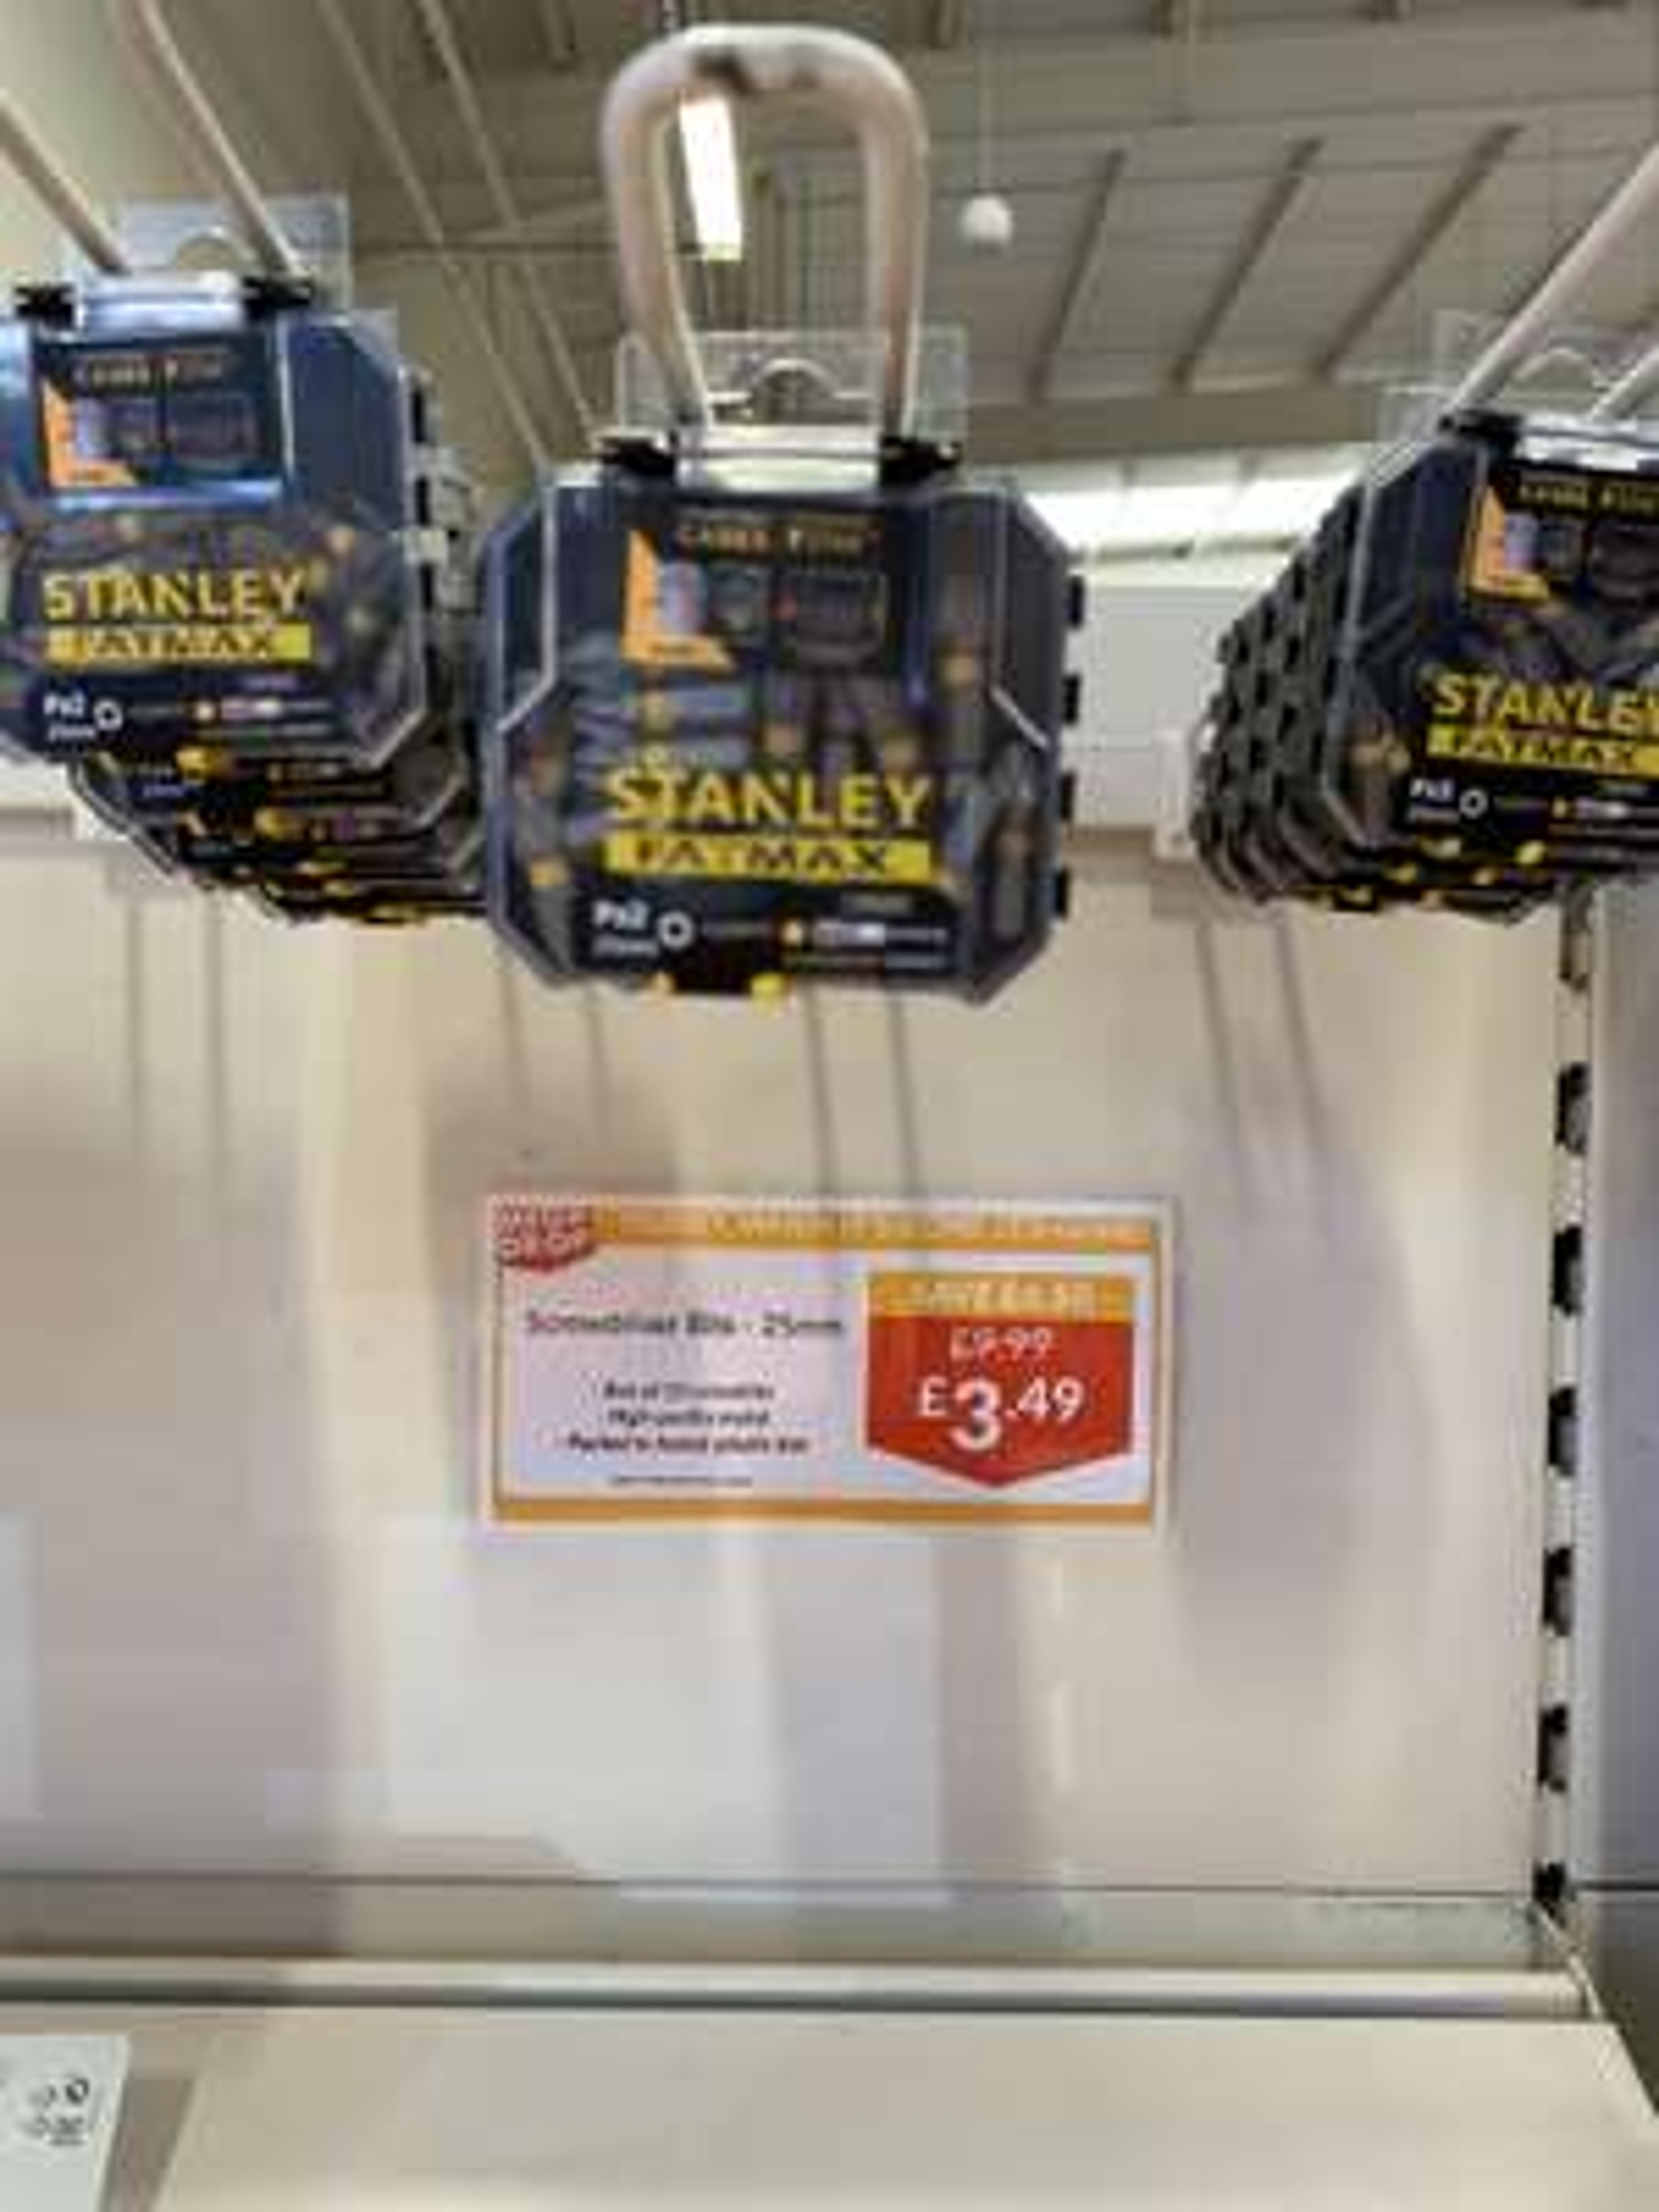 Stanley fatmax screw bits 25mm x 20 - £3.49 @ The Range Glasgow